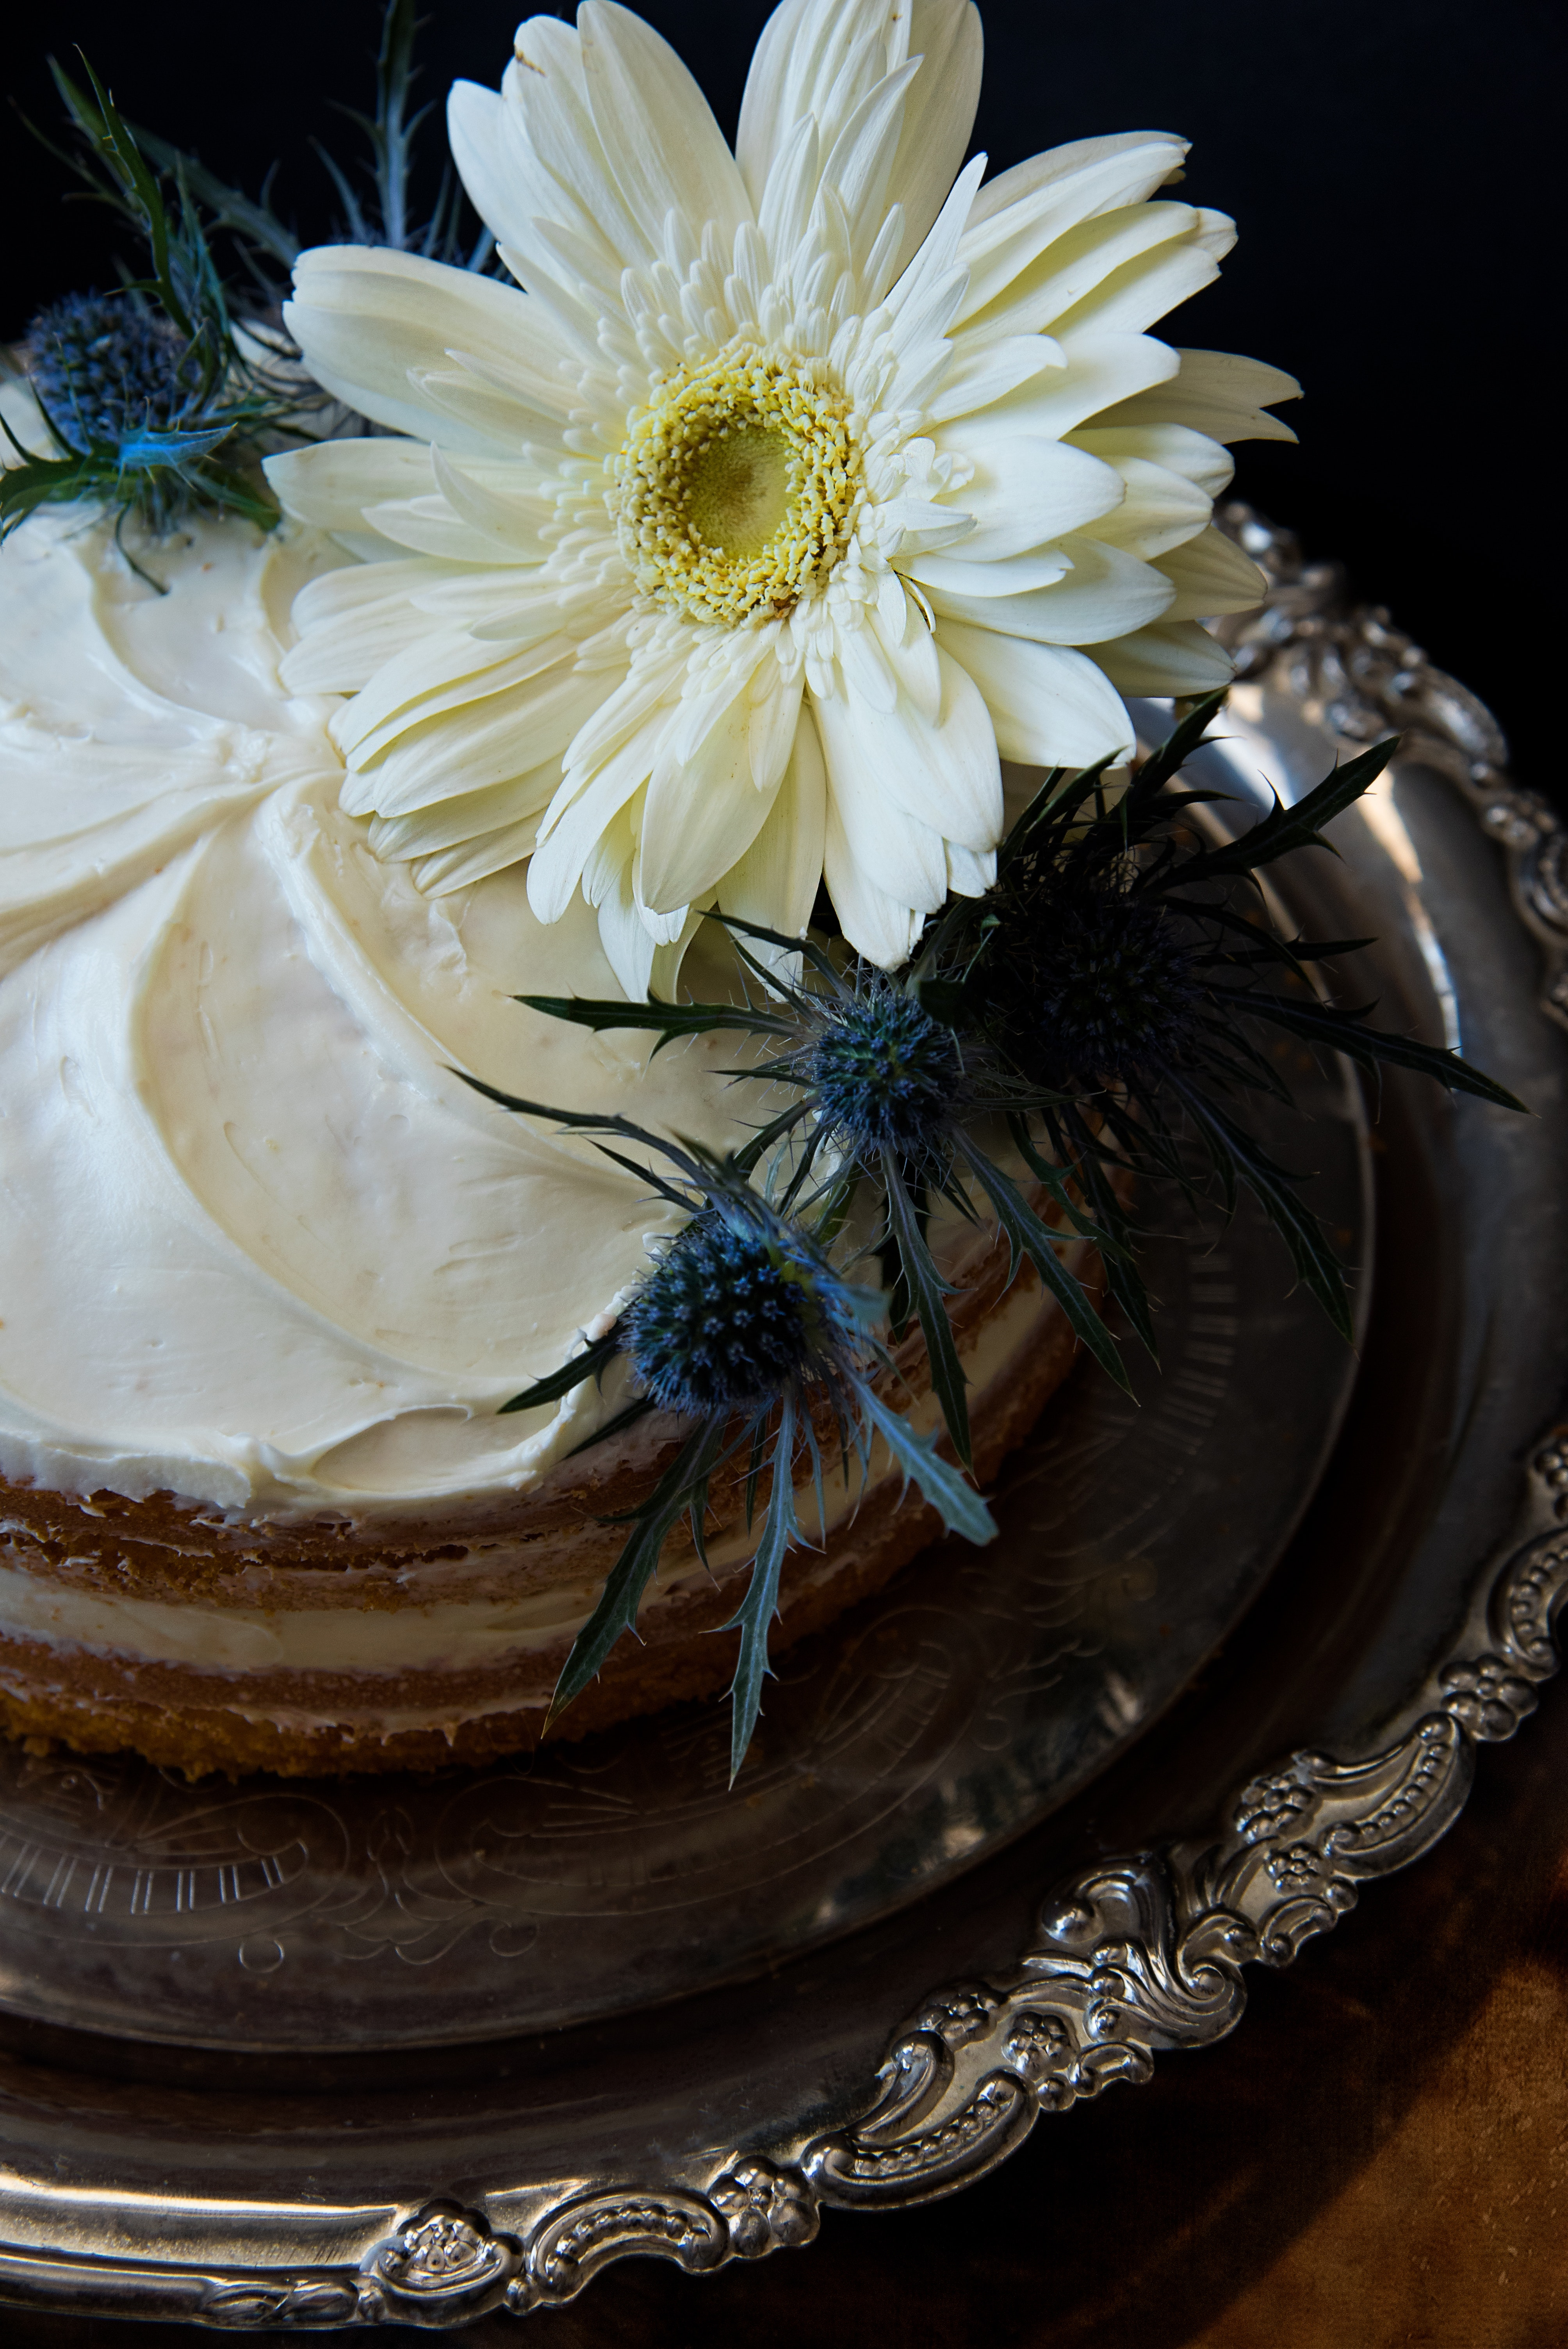 White flowers on round cake with white cream photo